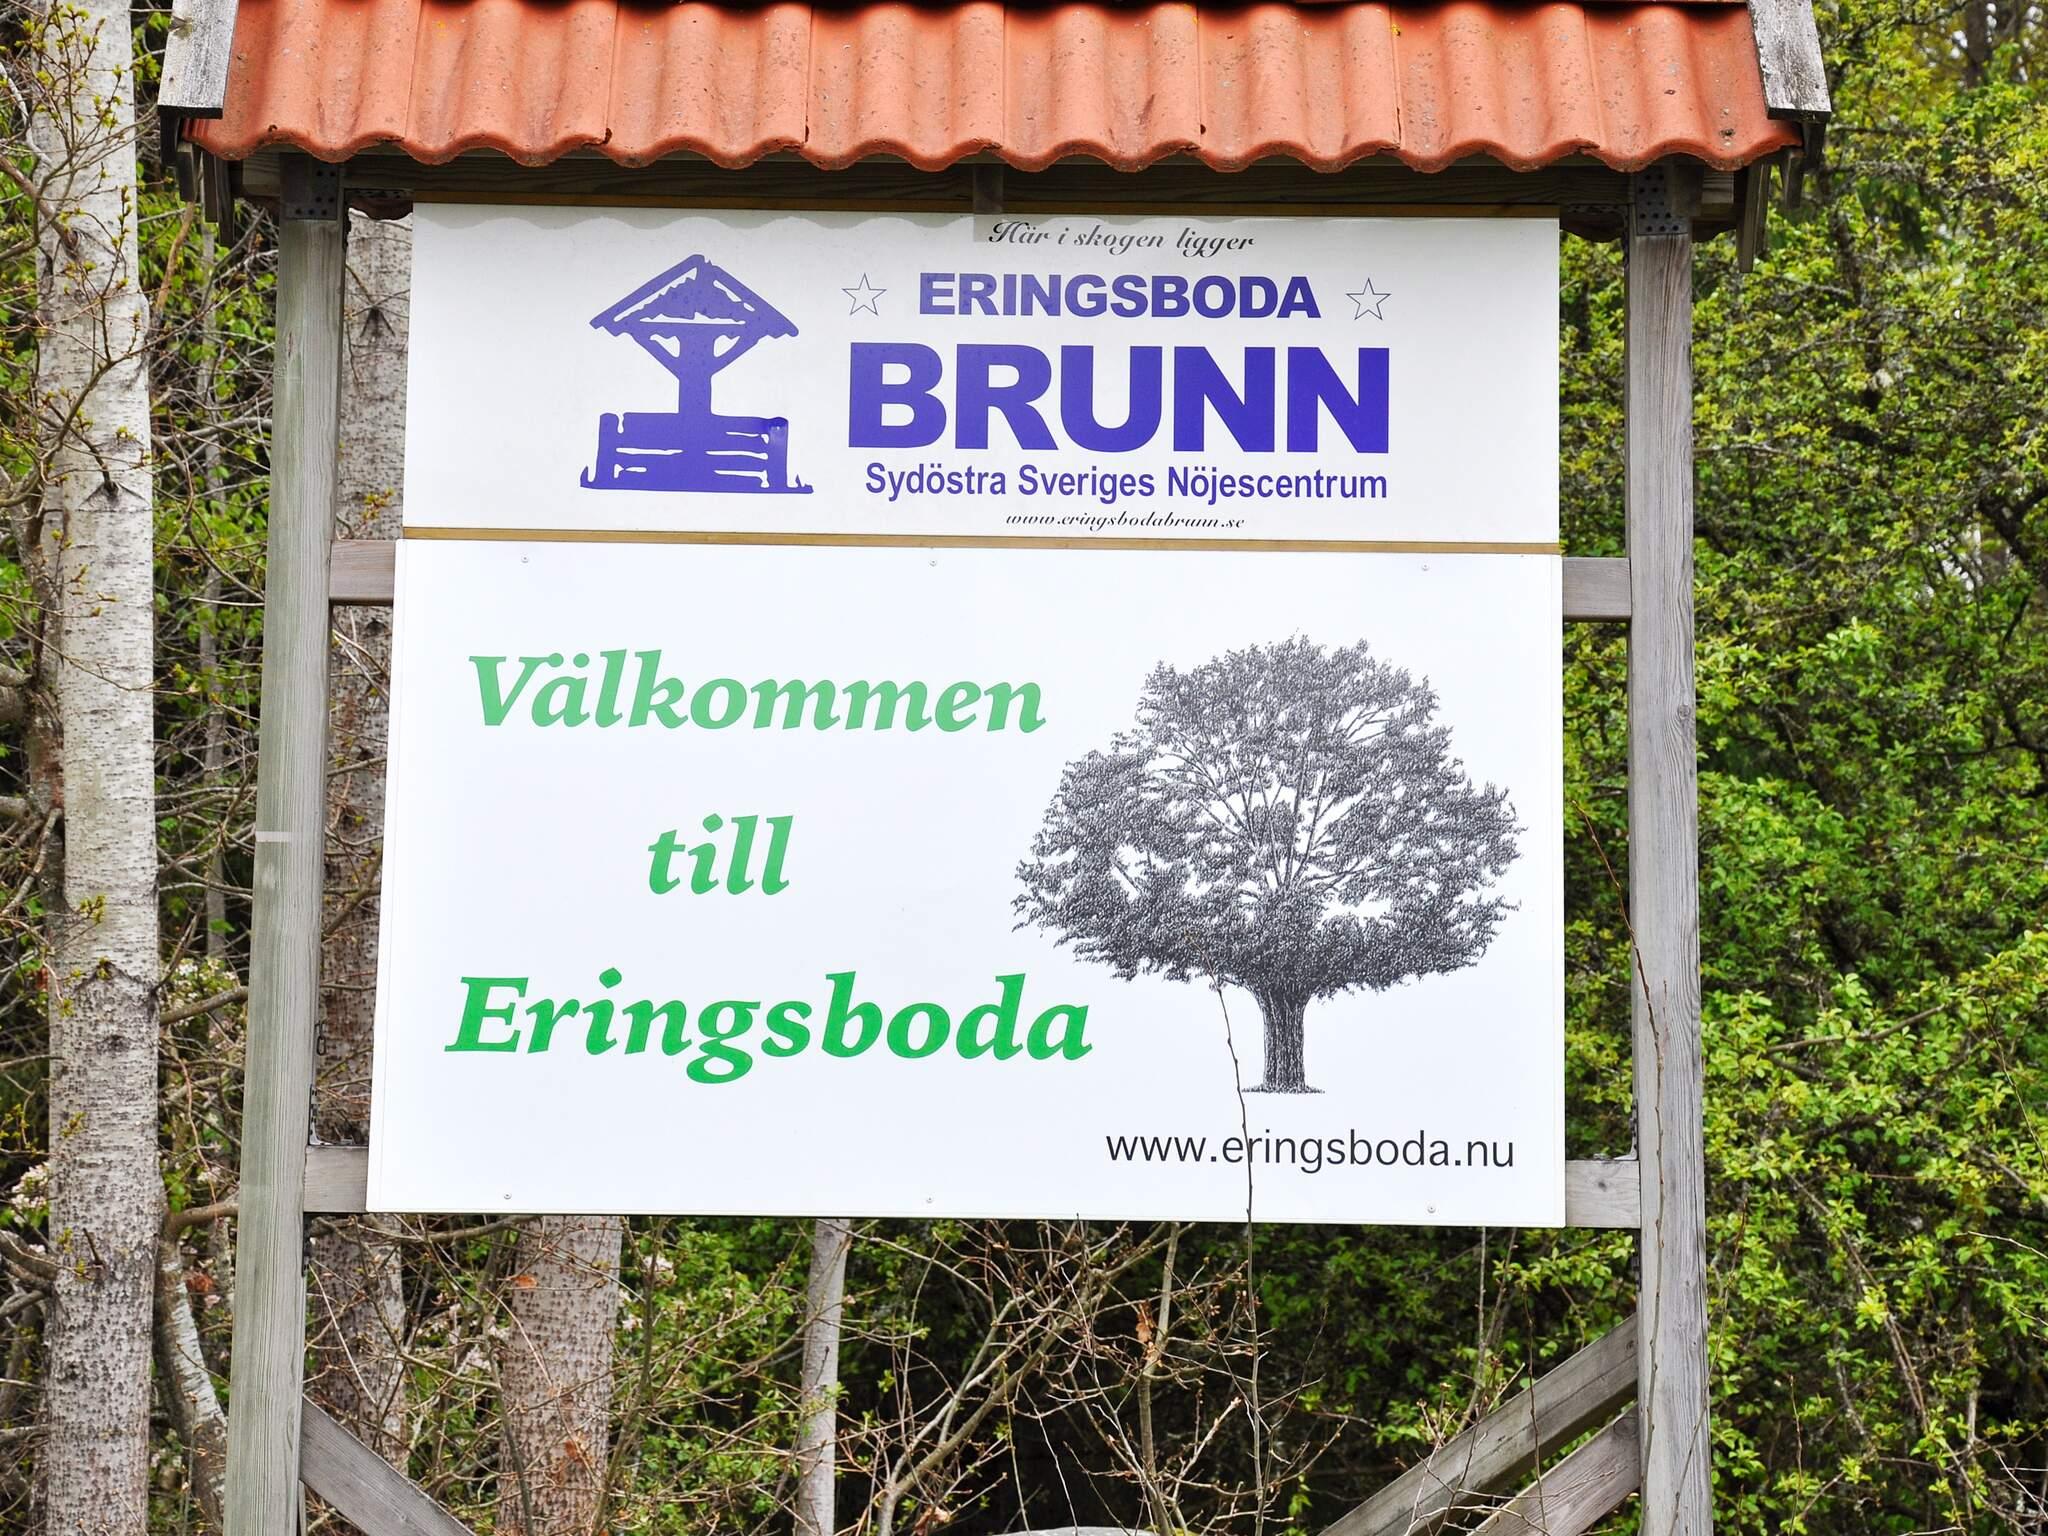 Ferienhaus Karlskrona (2624317), Eringsboda, Blekinge län, Südschweden, Schweden, Bild 18